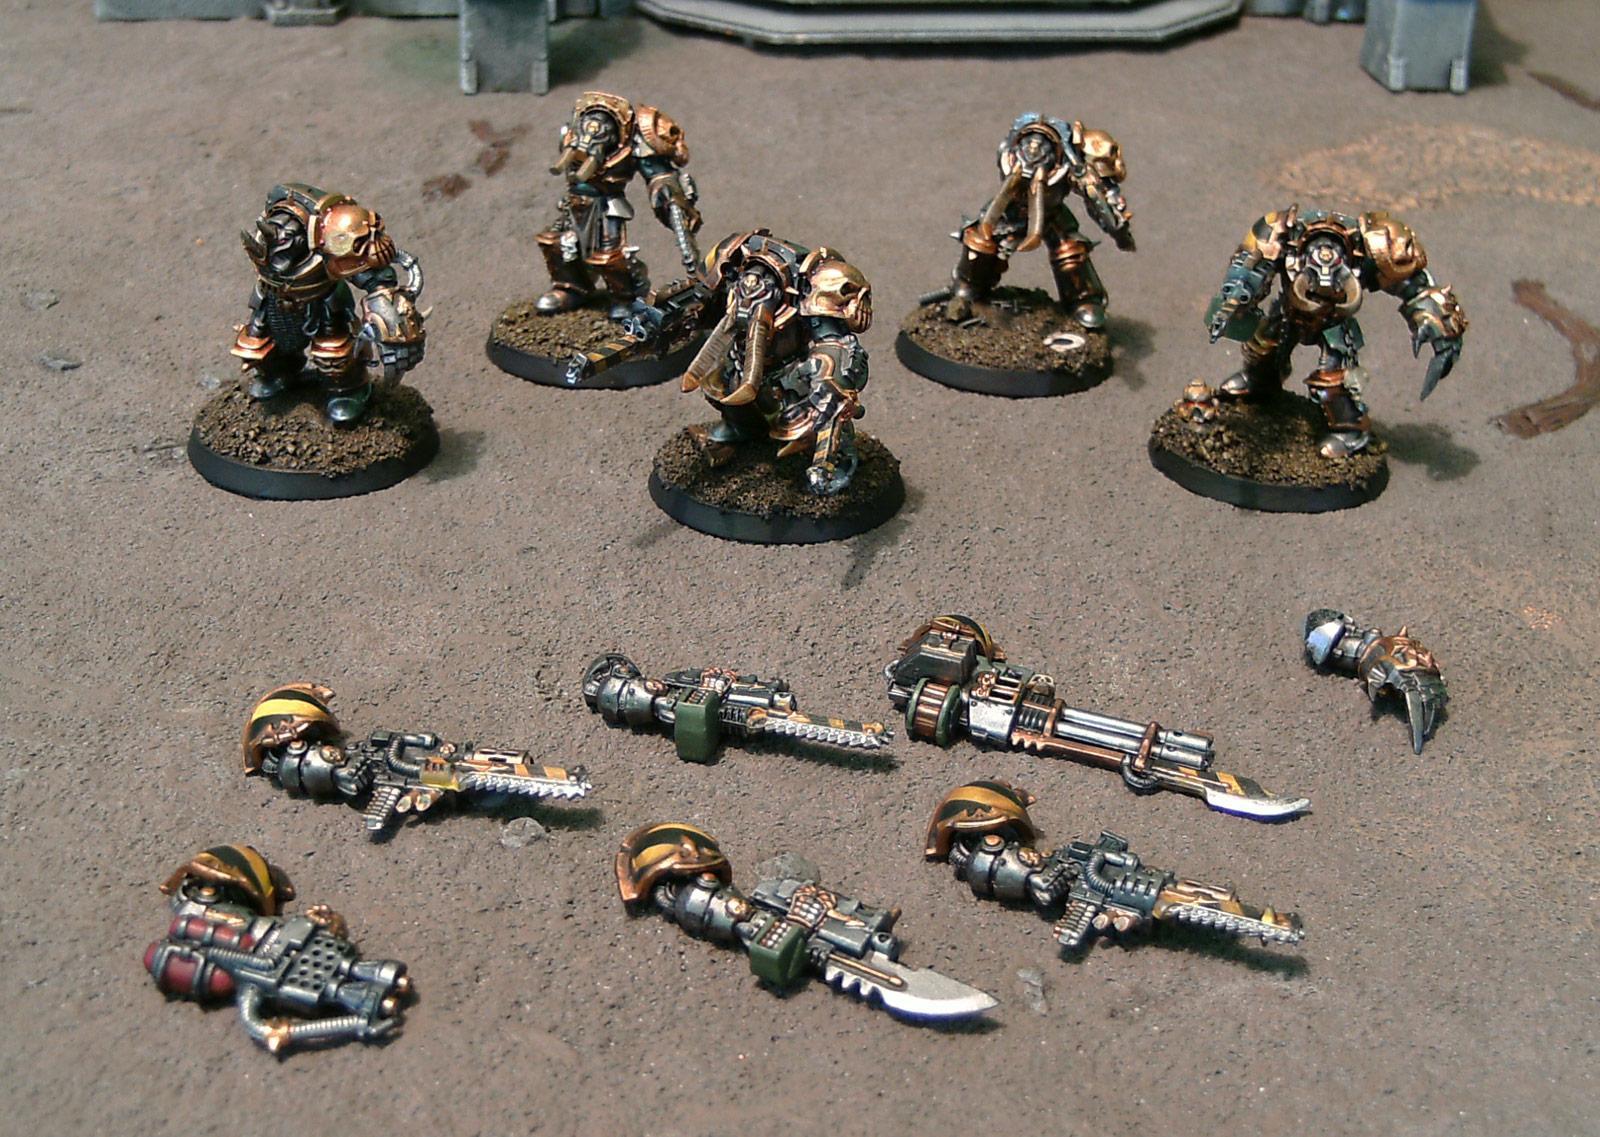 Chaos, Chaos Space Marines, Chaos Terminators, Homebrew, Iron Marauders, Ouze, Terminator Armor, Warhammer 40,000